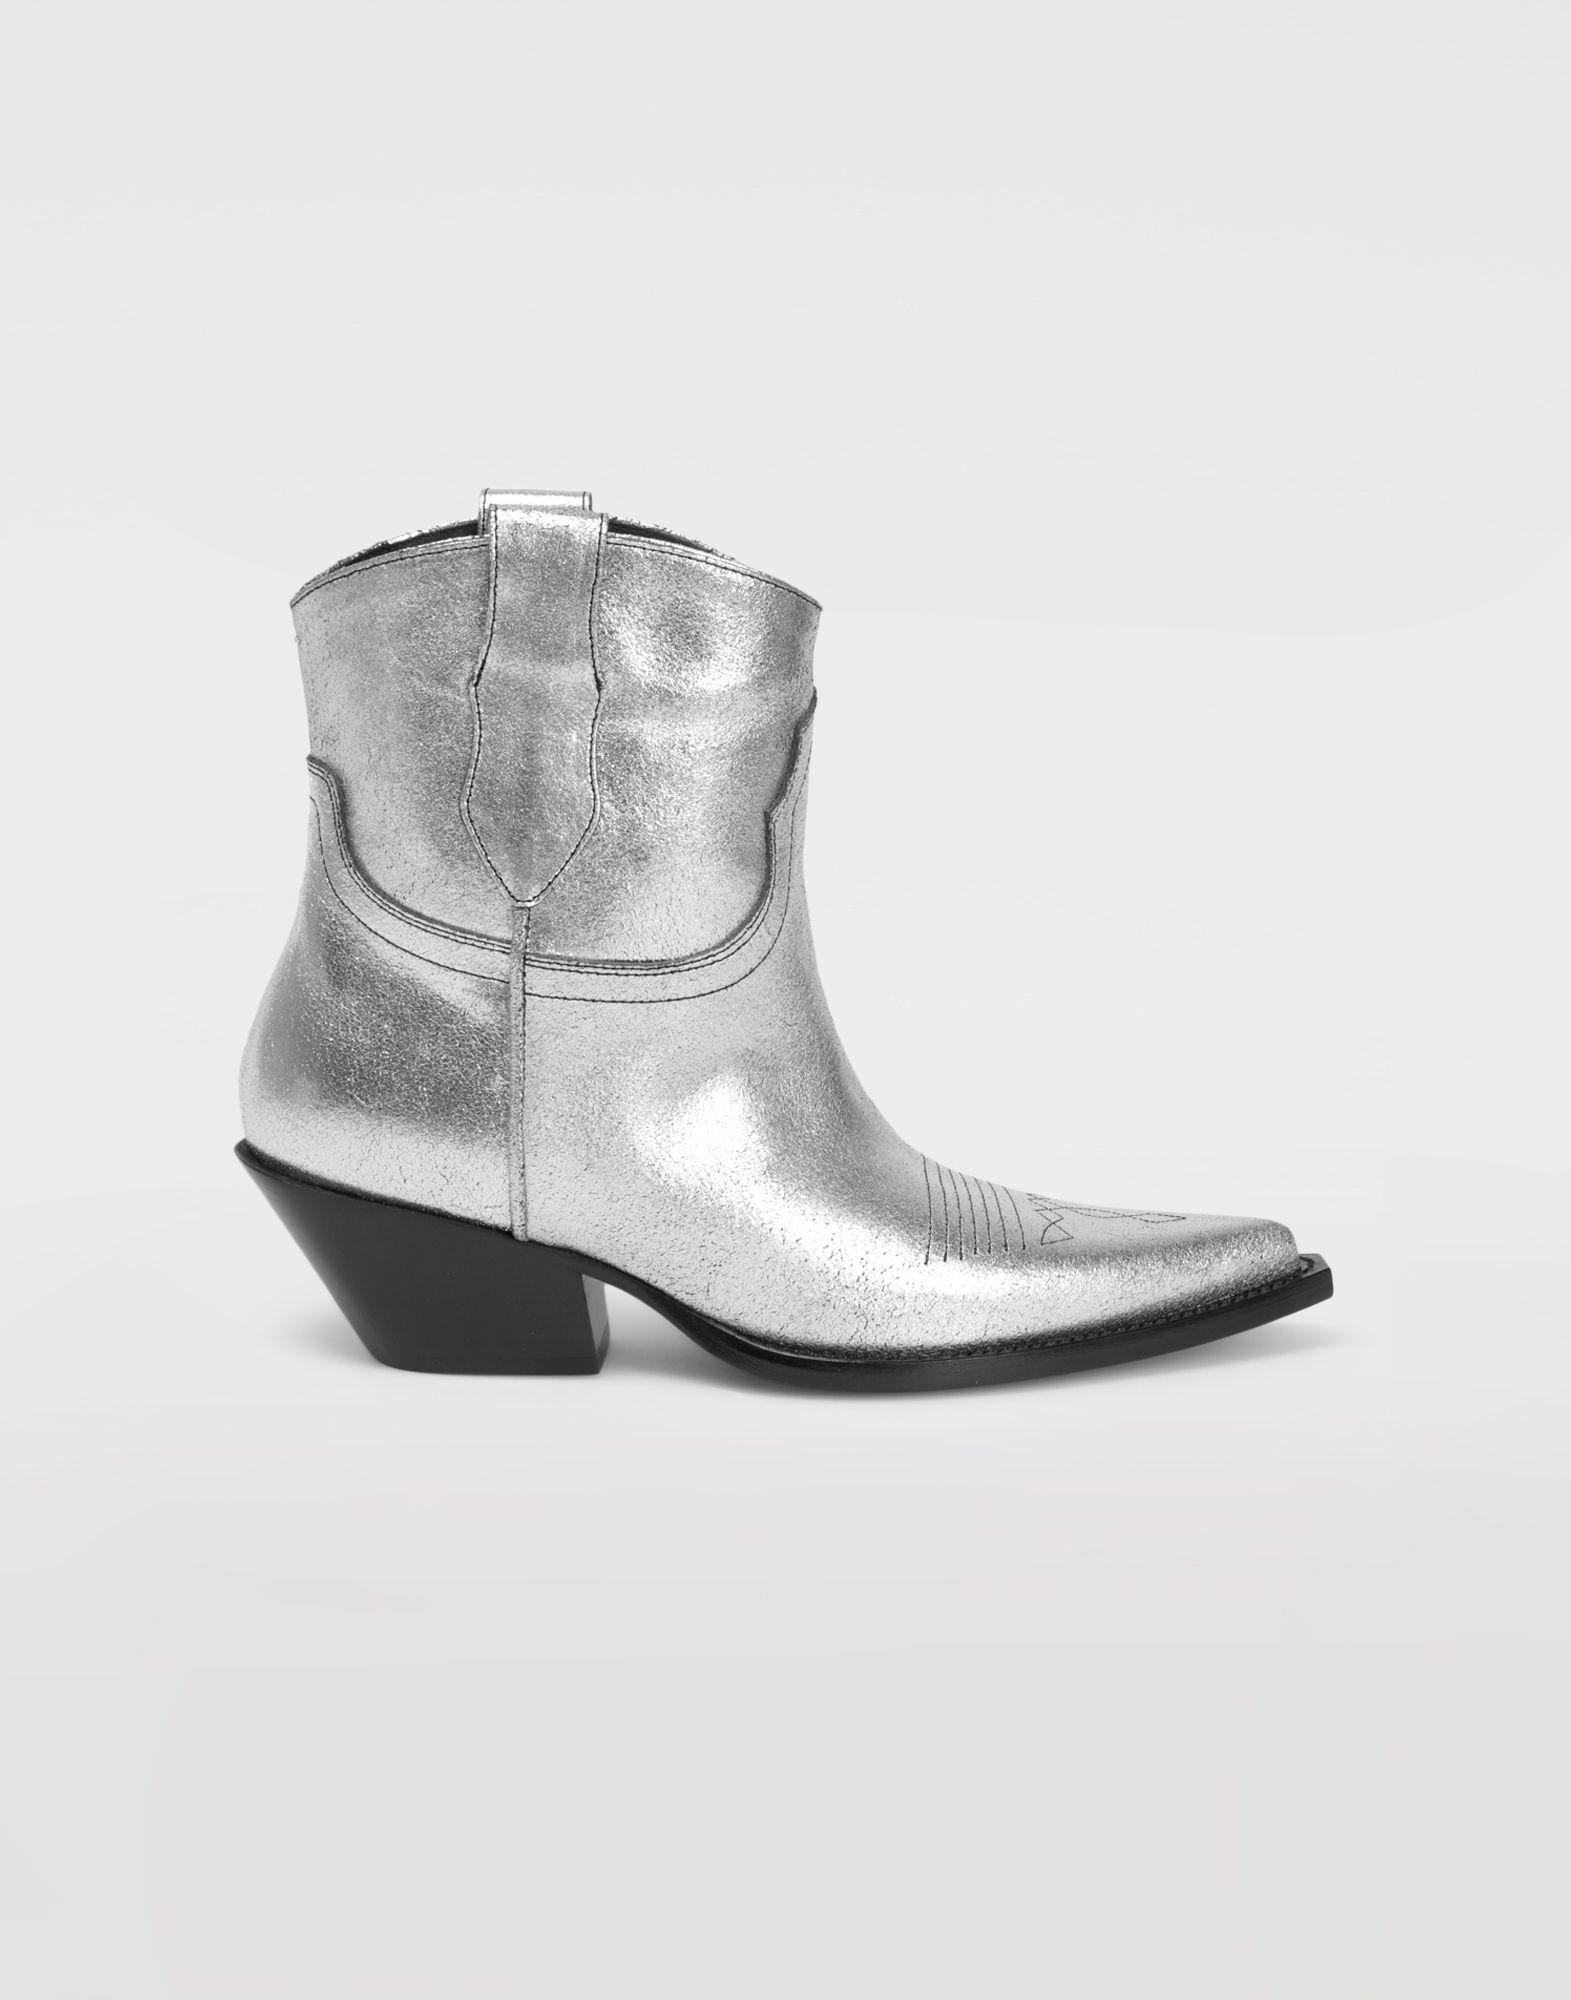 MAISON MARGIELA Silver cowboy boots Ankle boots Woman f